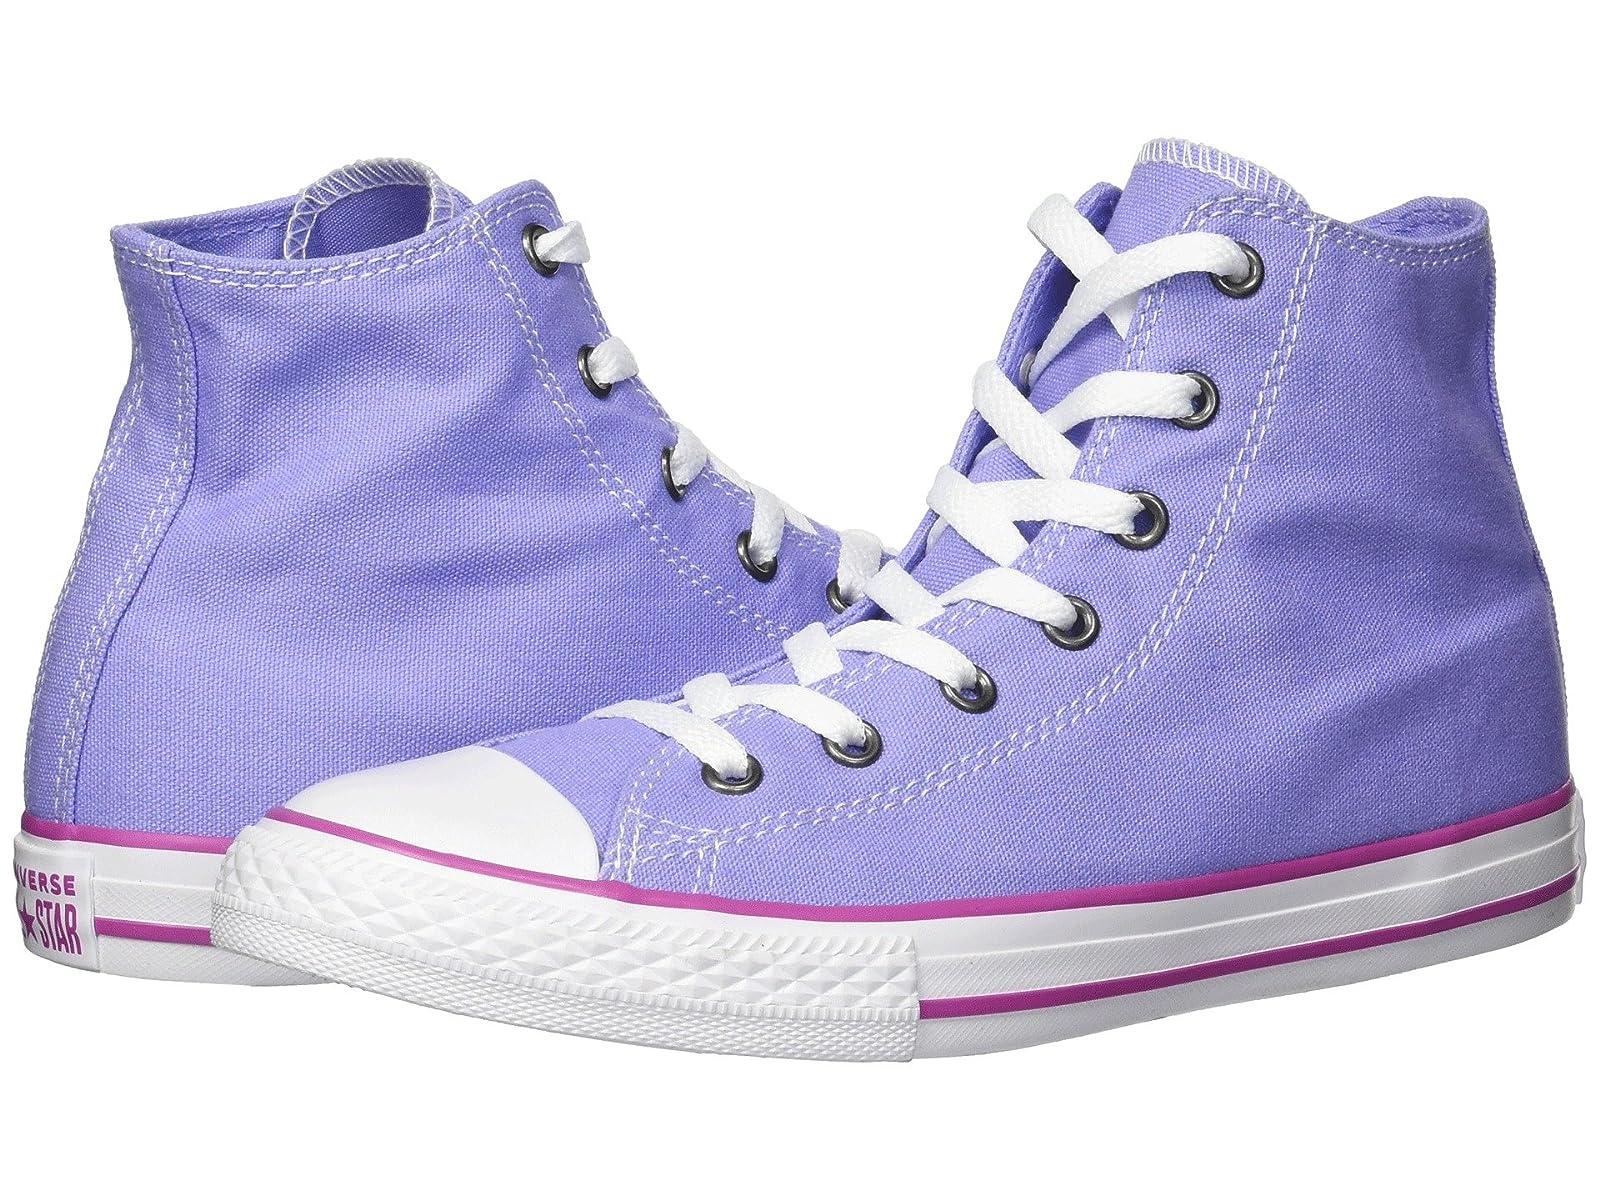 Converse Kids Chuck Taylor® All Star® Seasonal Hi (Little Kid/Big Kid)Atmospheric grades have affordable shoes